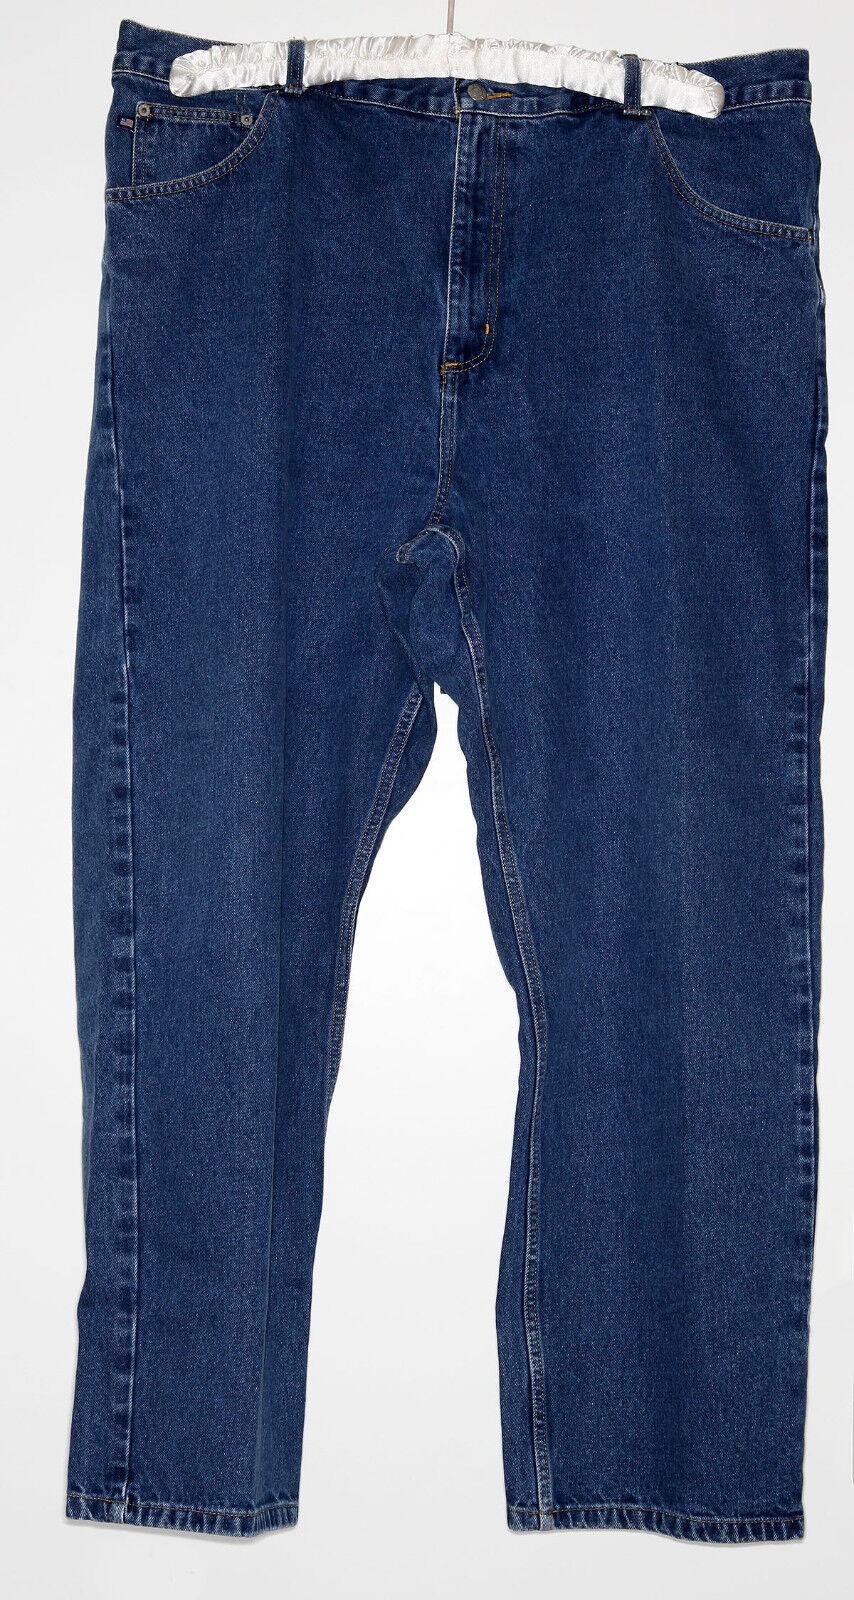 Vintage RL Ralph Lauren Polo Jeans Company W44 L32 Übergröße Sammlerstück wieneu